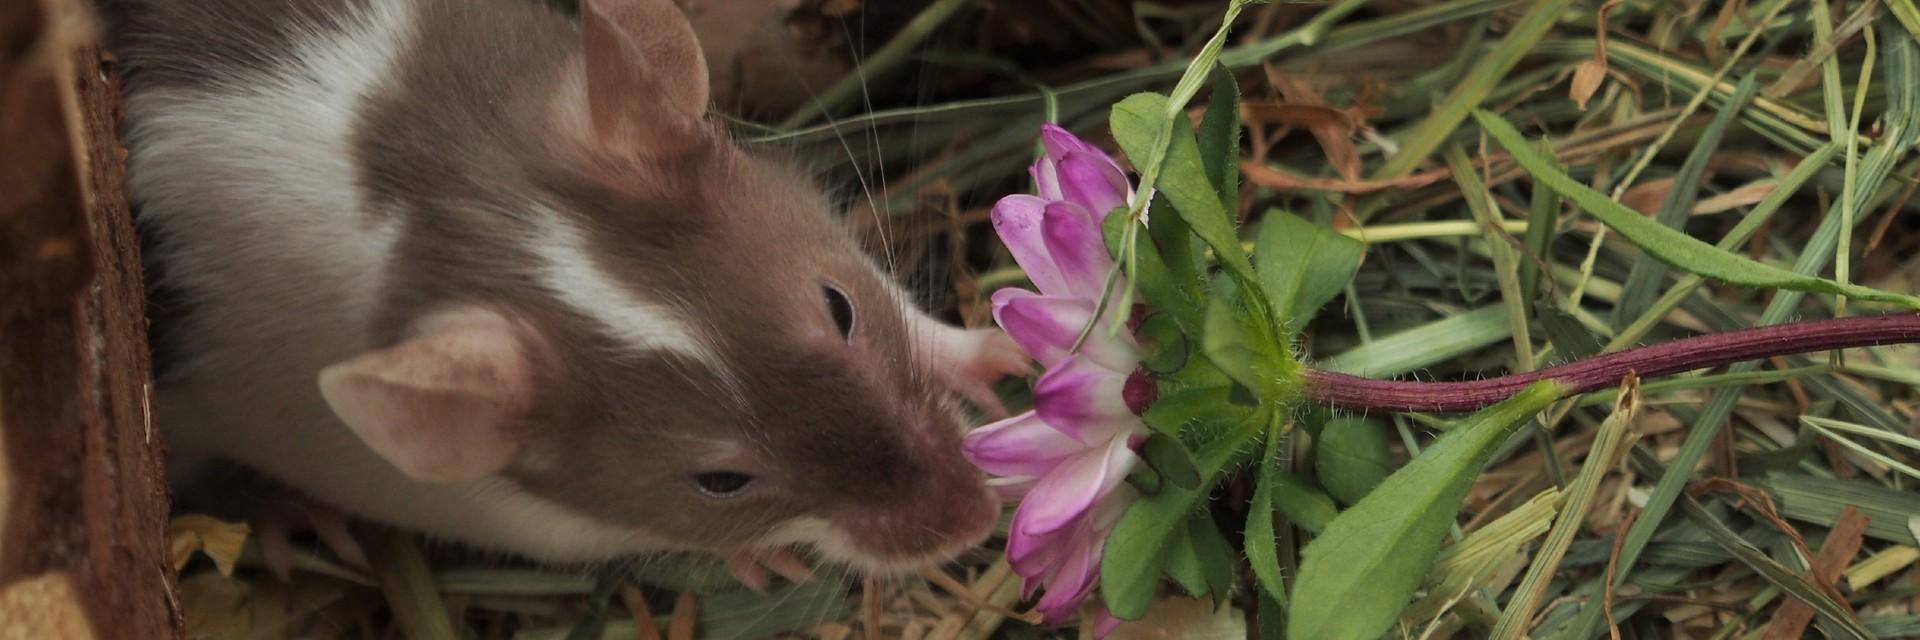 Pet mice snack between 15-20 times a da